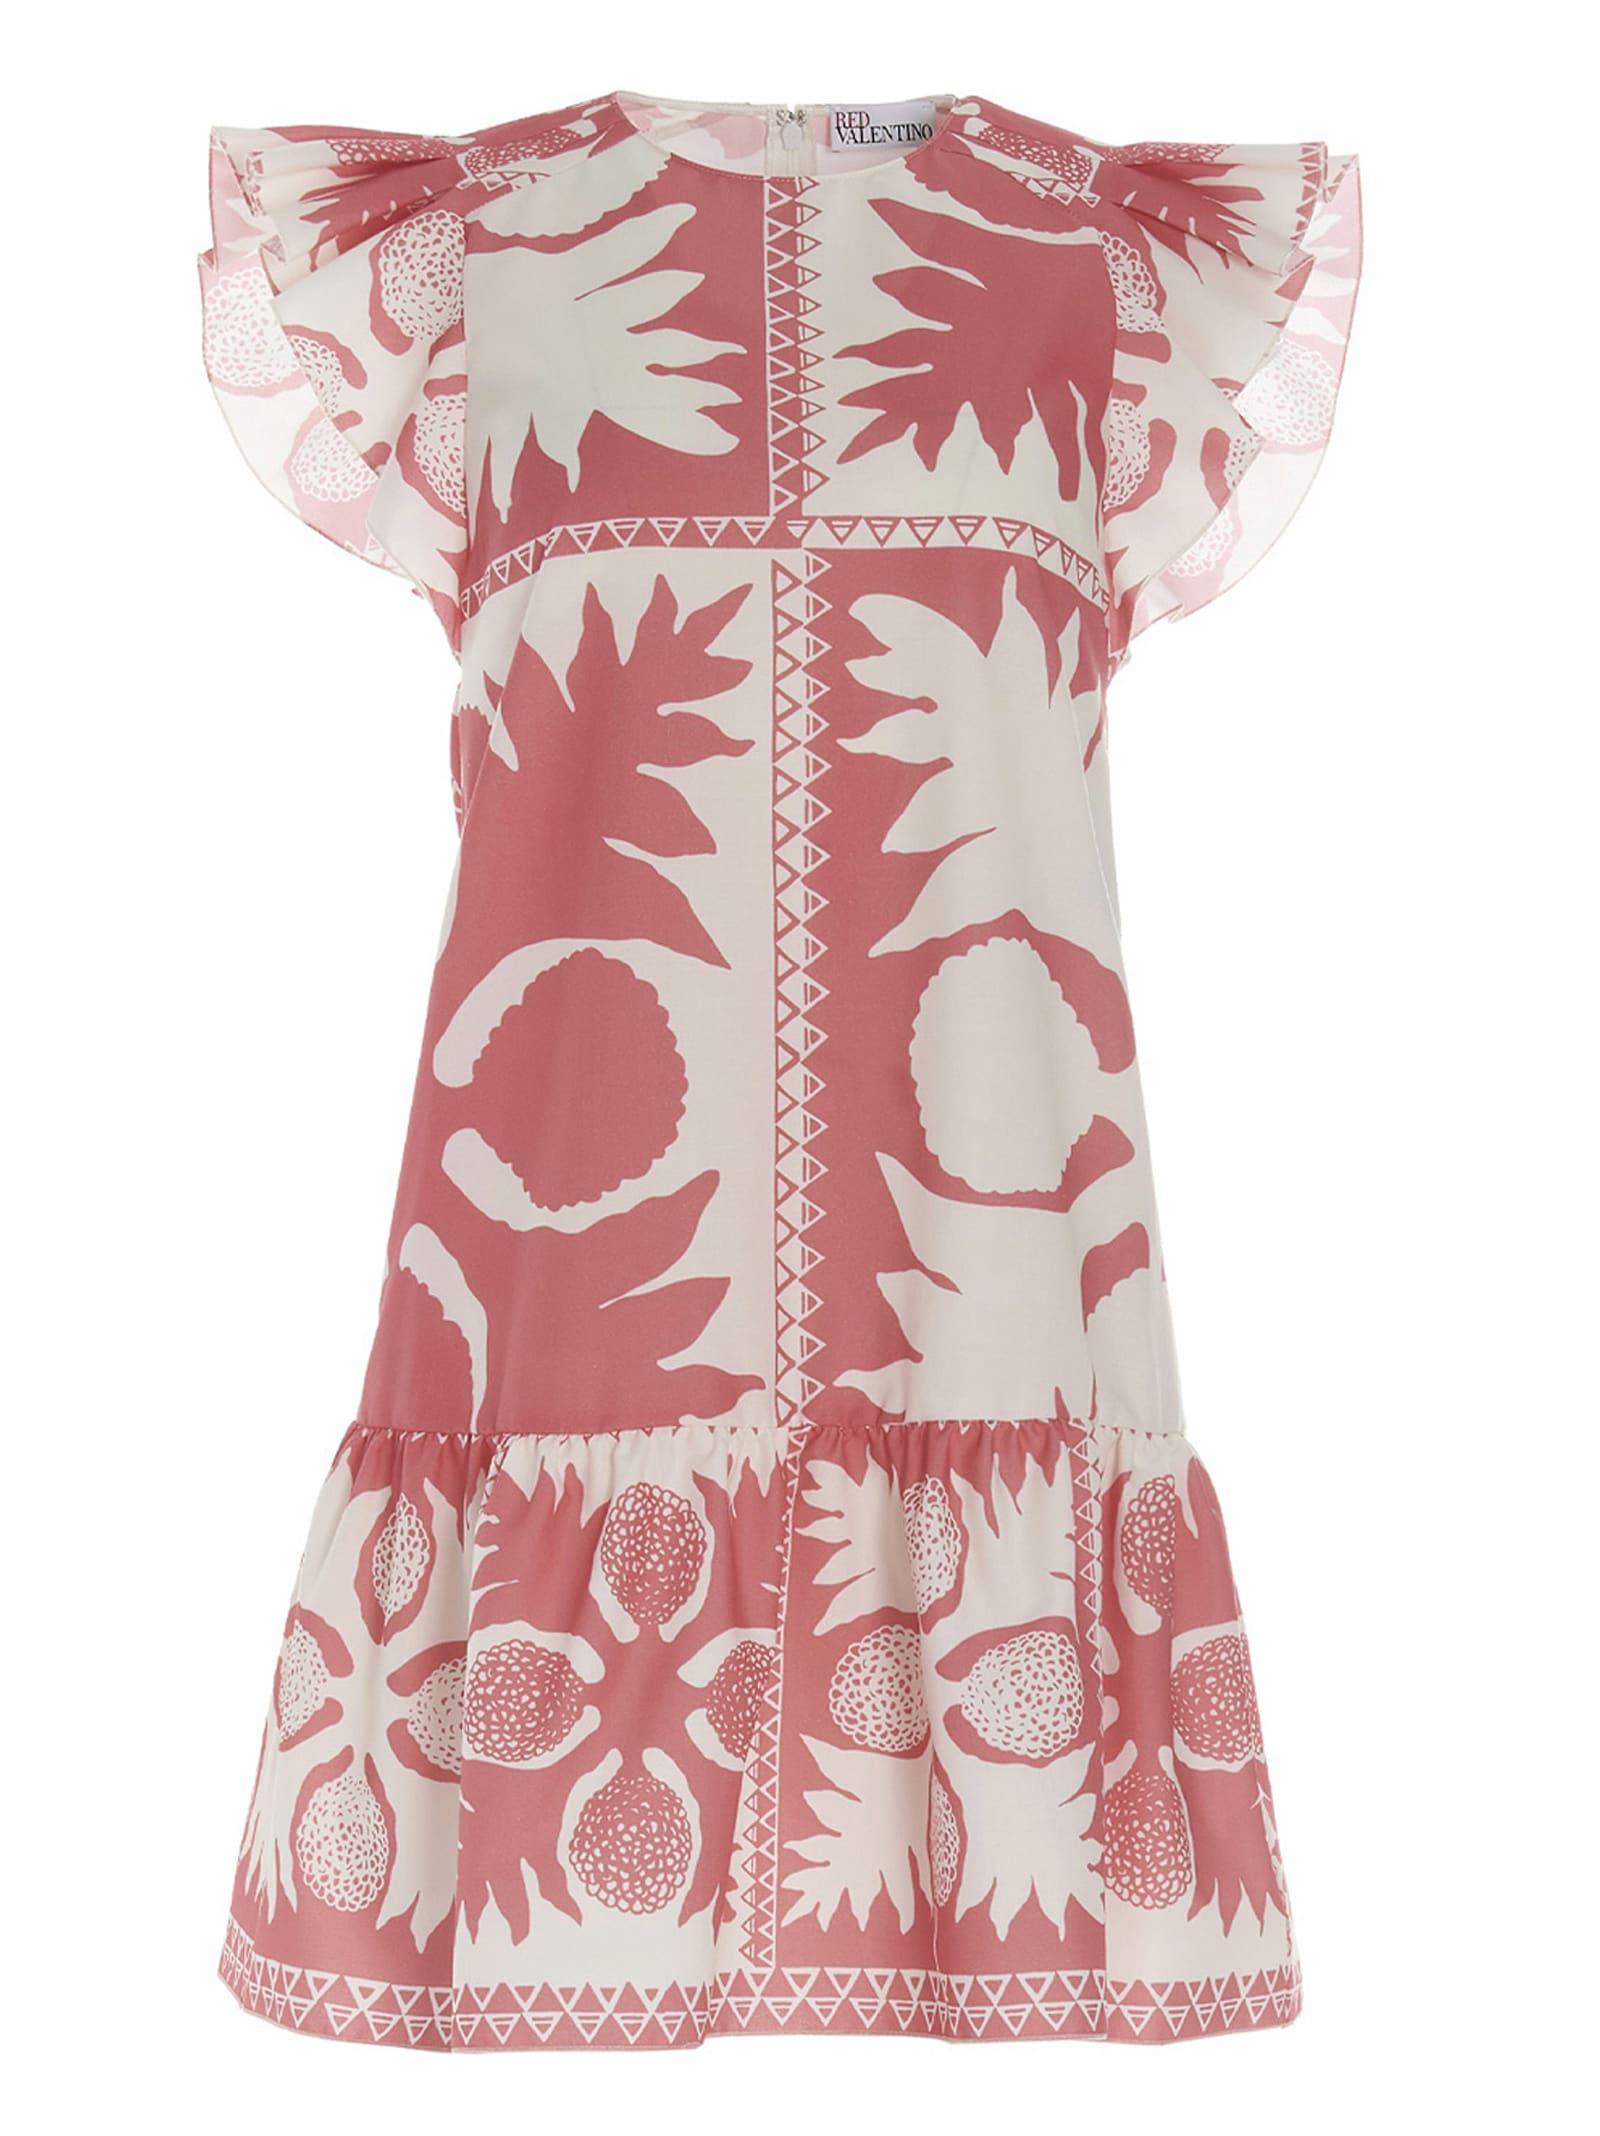 Red Valentino flower Damier Dress